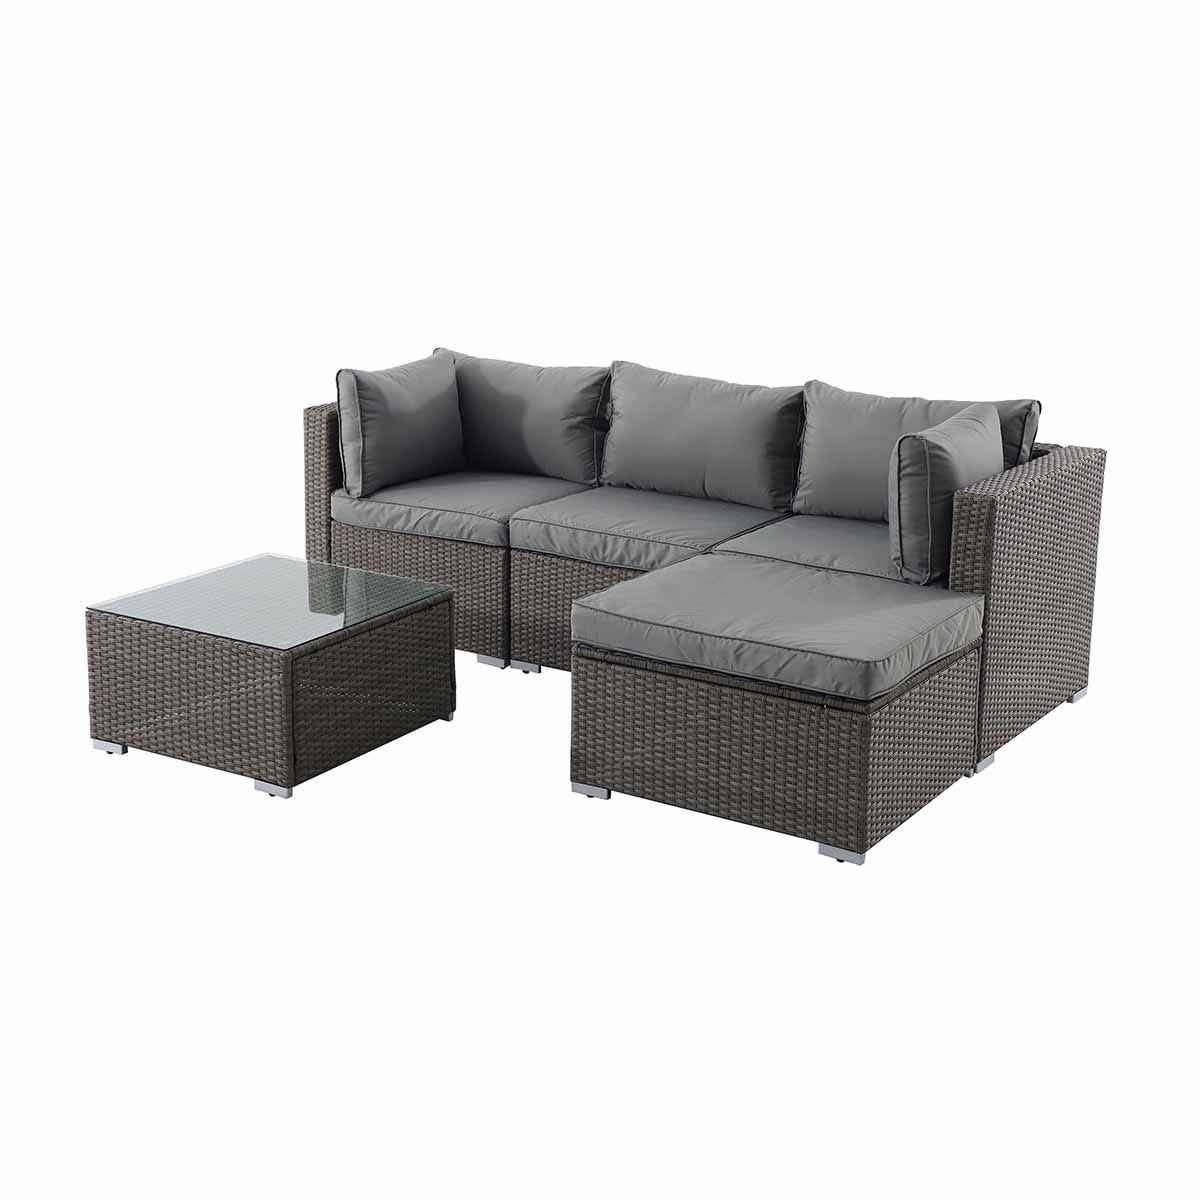 Creador 3-4 Seater Rattan Sofa Set - Brown/Grey